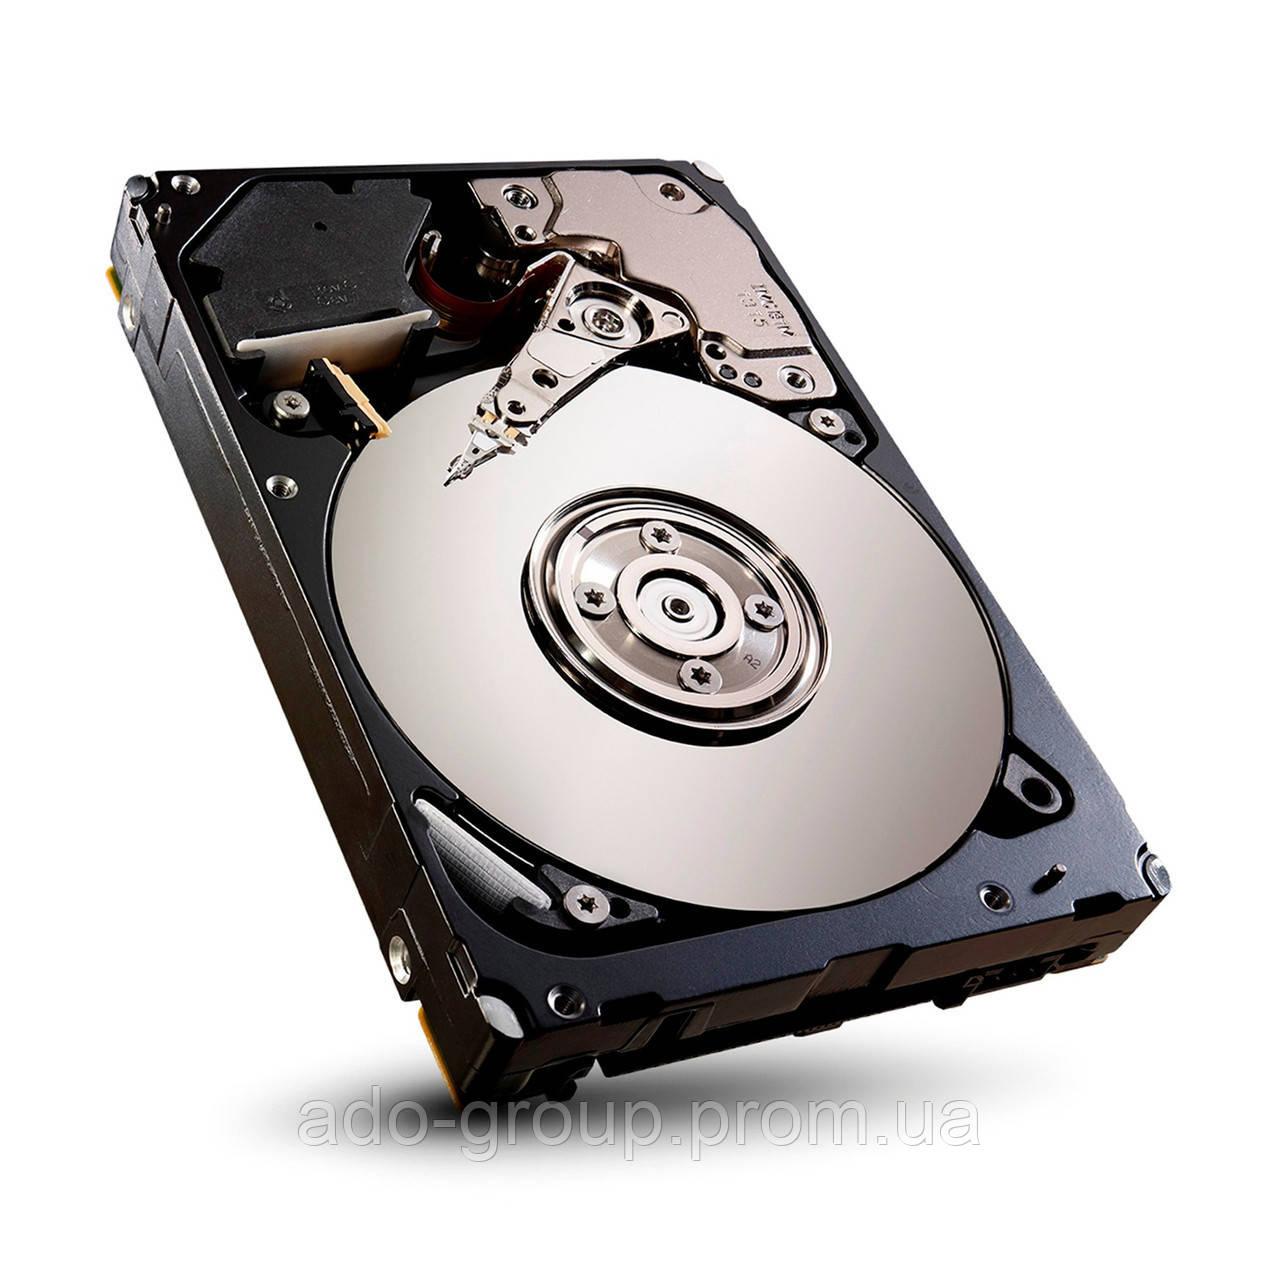 "341-1674 Жесткий диск Dell 300Gb SAS 10K  3.5"" +"